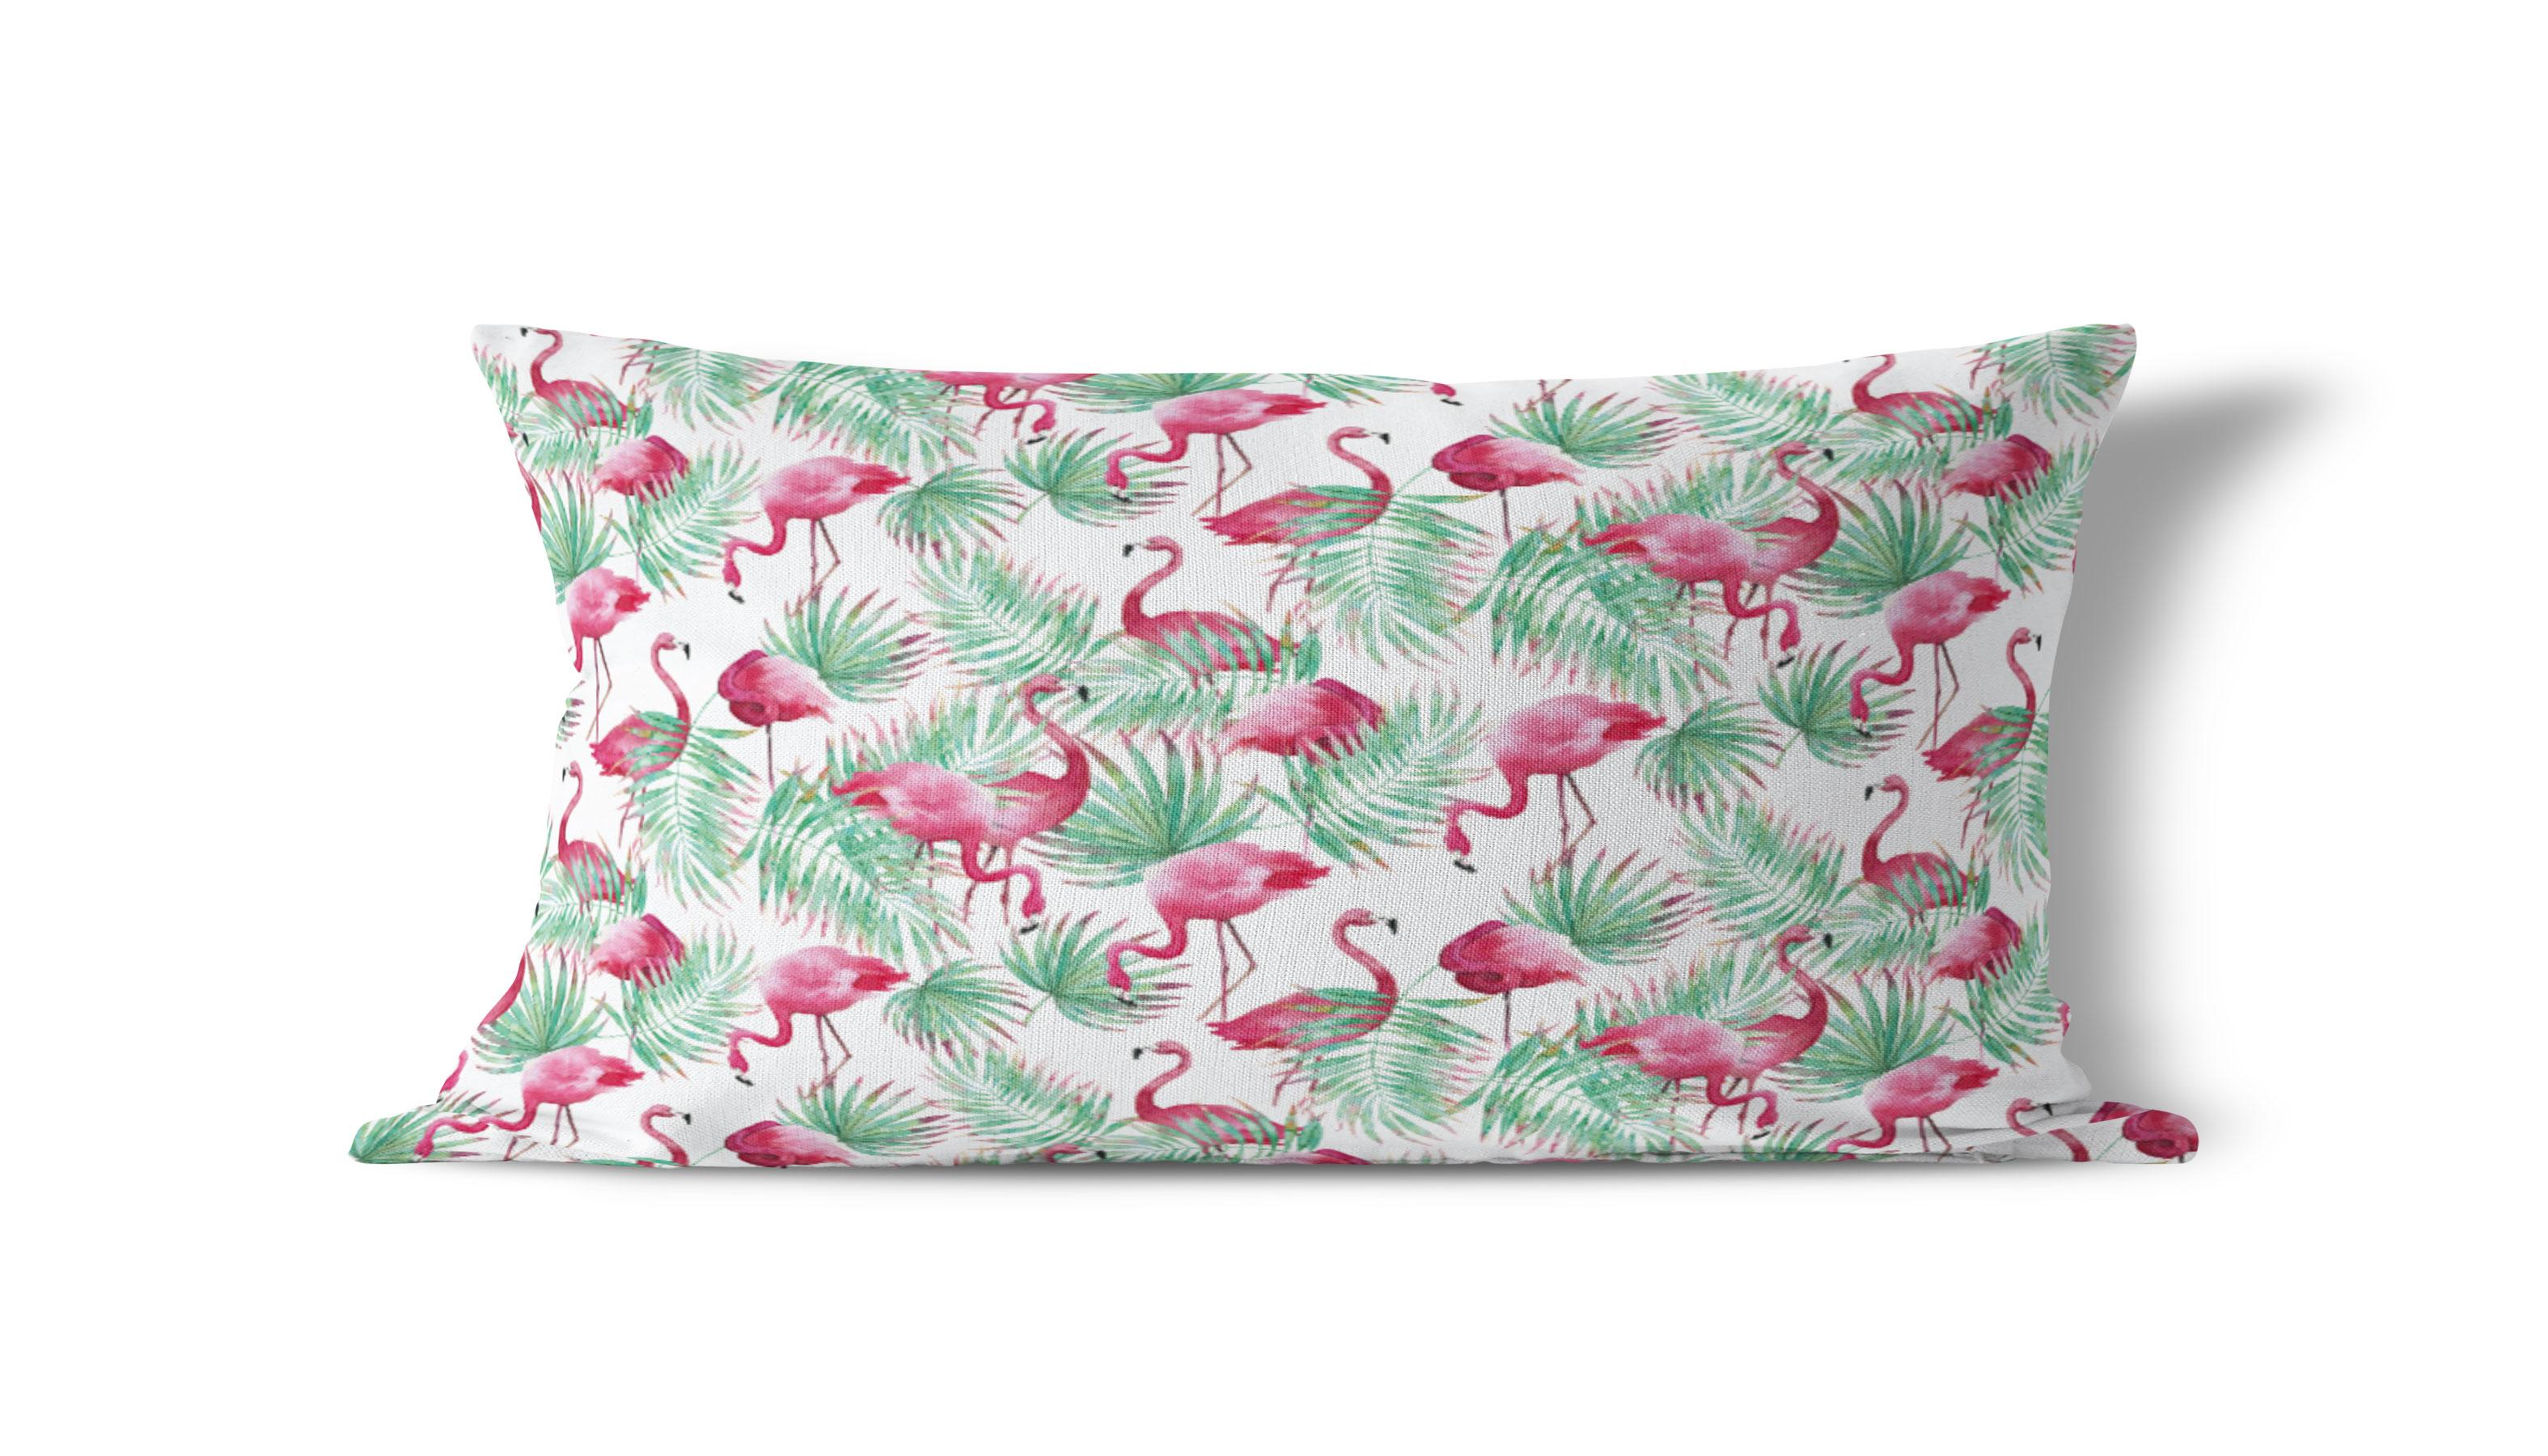 Isabella_FlamingoParadiseSmall_rechthoek